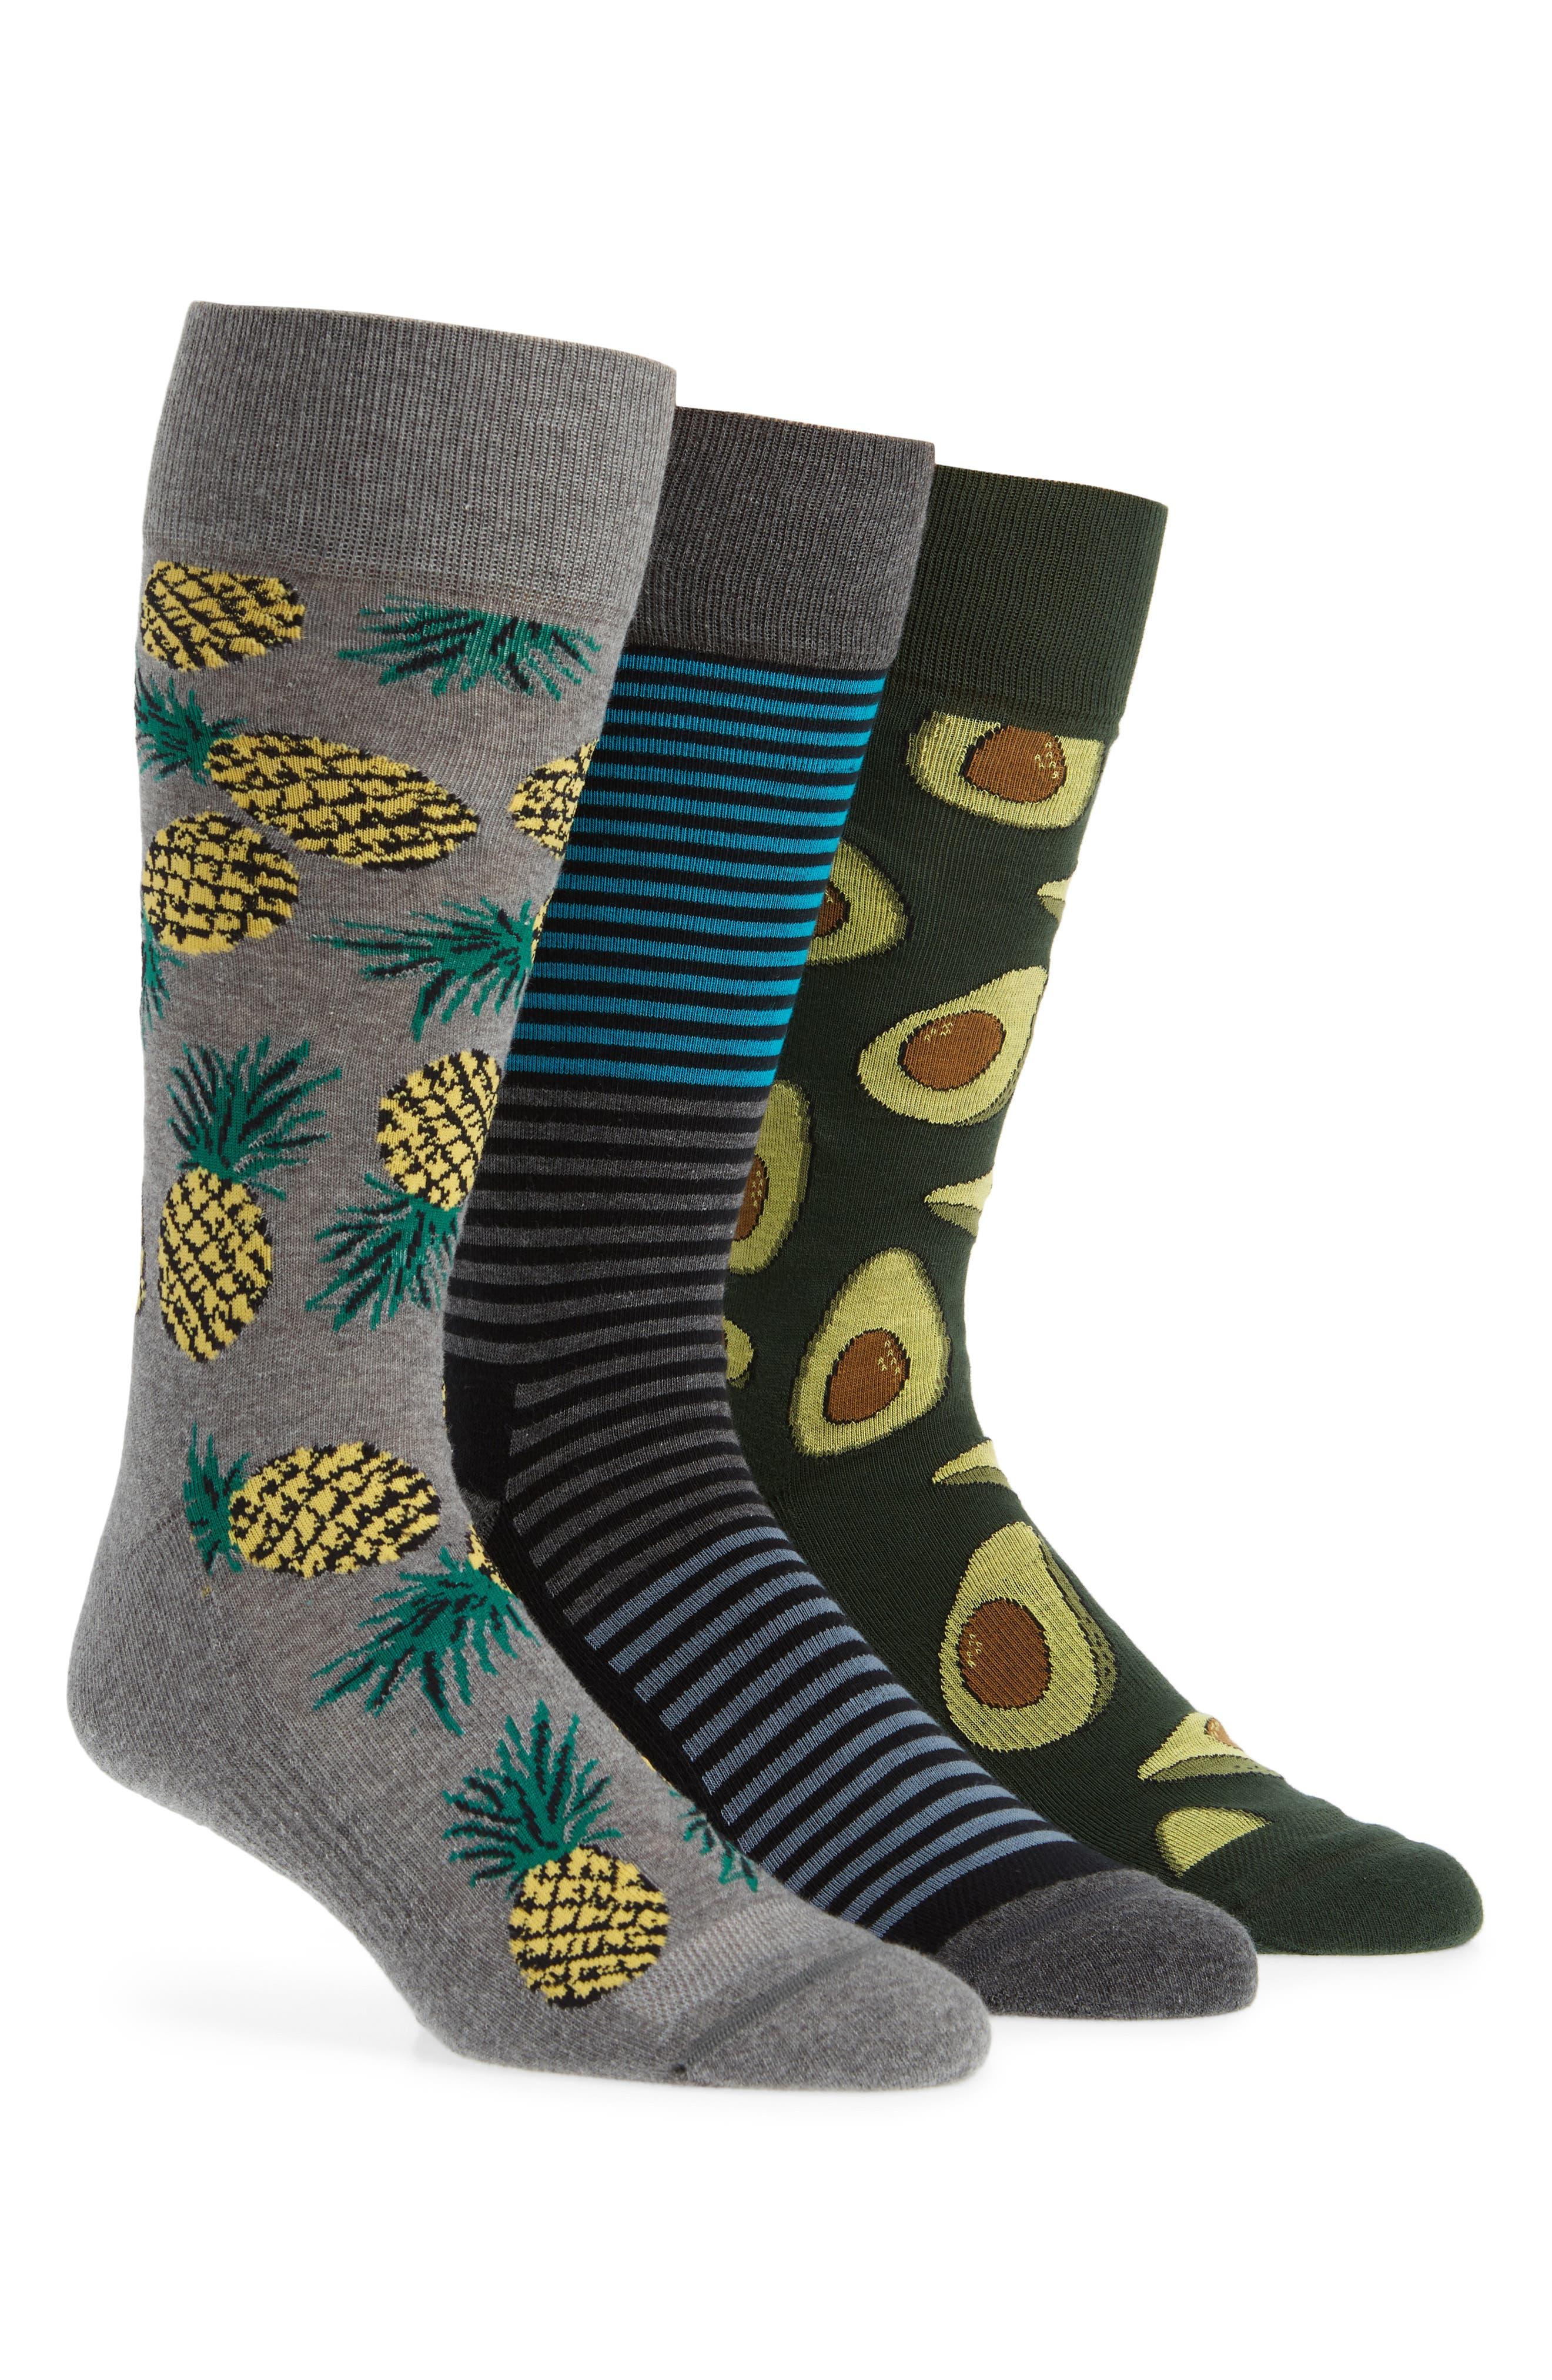 3-Pack Novelty Socks Box Set,                             Main thumbnail 1, color,                             AVOCADO/ PINEAPPLE/ STRIPE